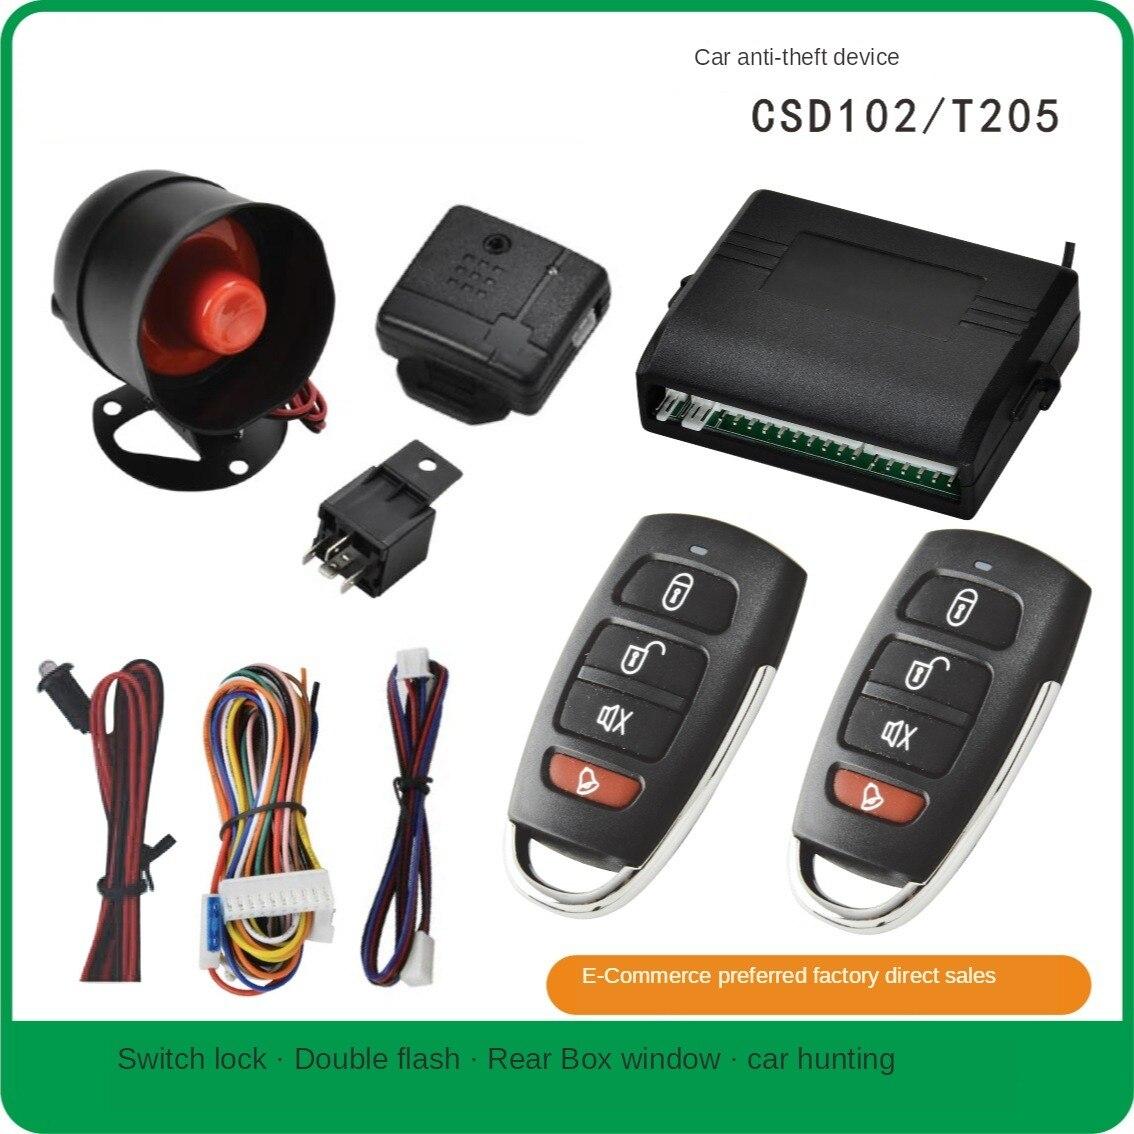 Car Alarm Vehicle System 1-Way Universal Protection Security System Keyless Entry Siren + 2 Remote Control Burglar